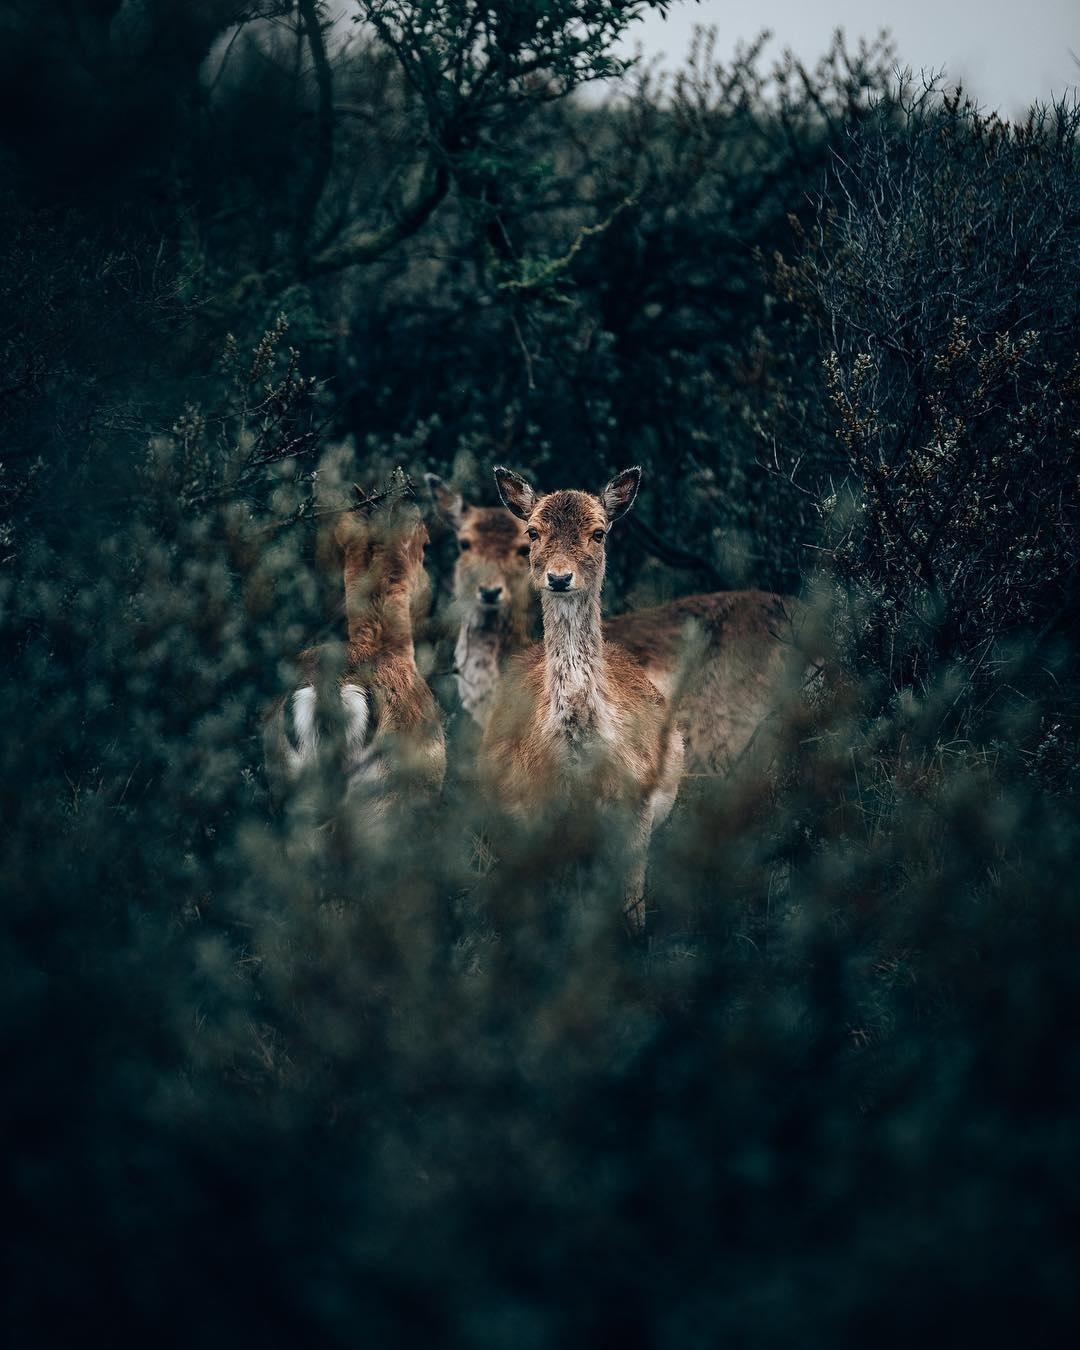 Фото Олени среди растительности, by Philipp Pilz